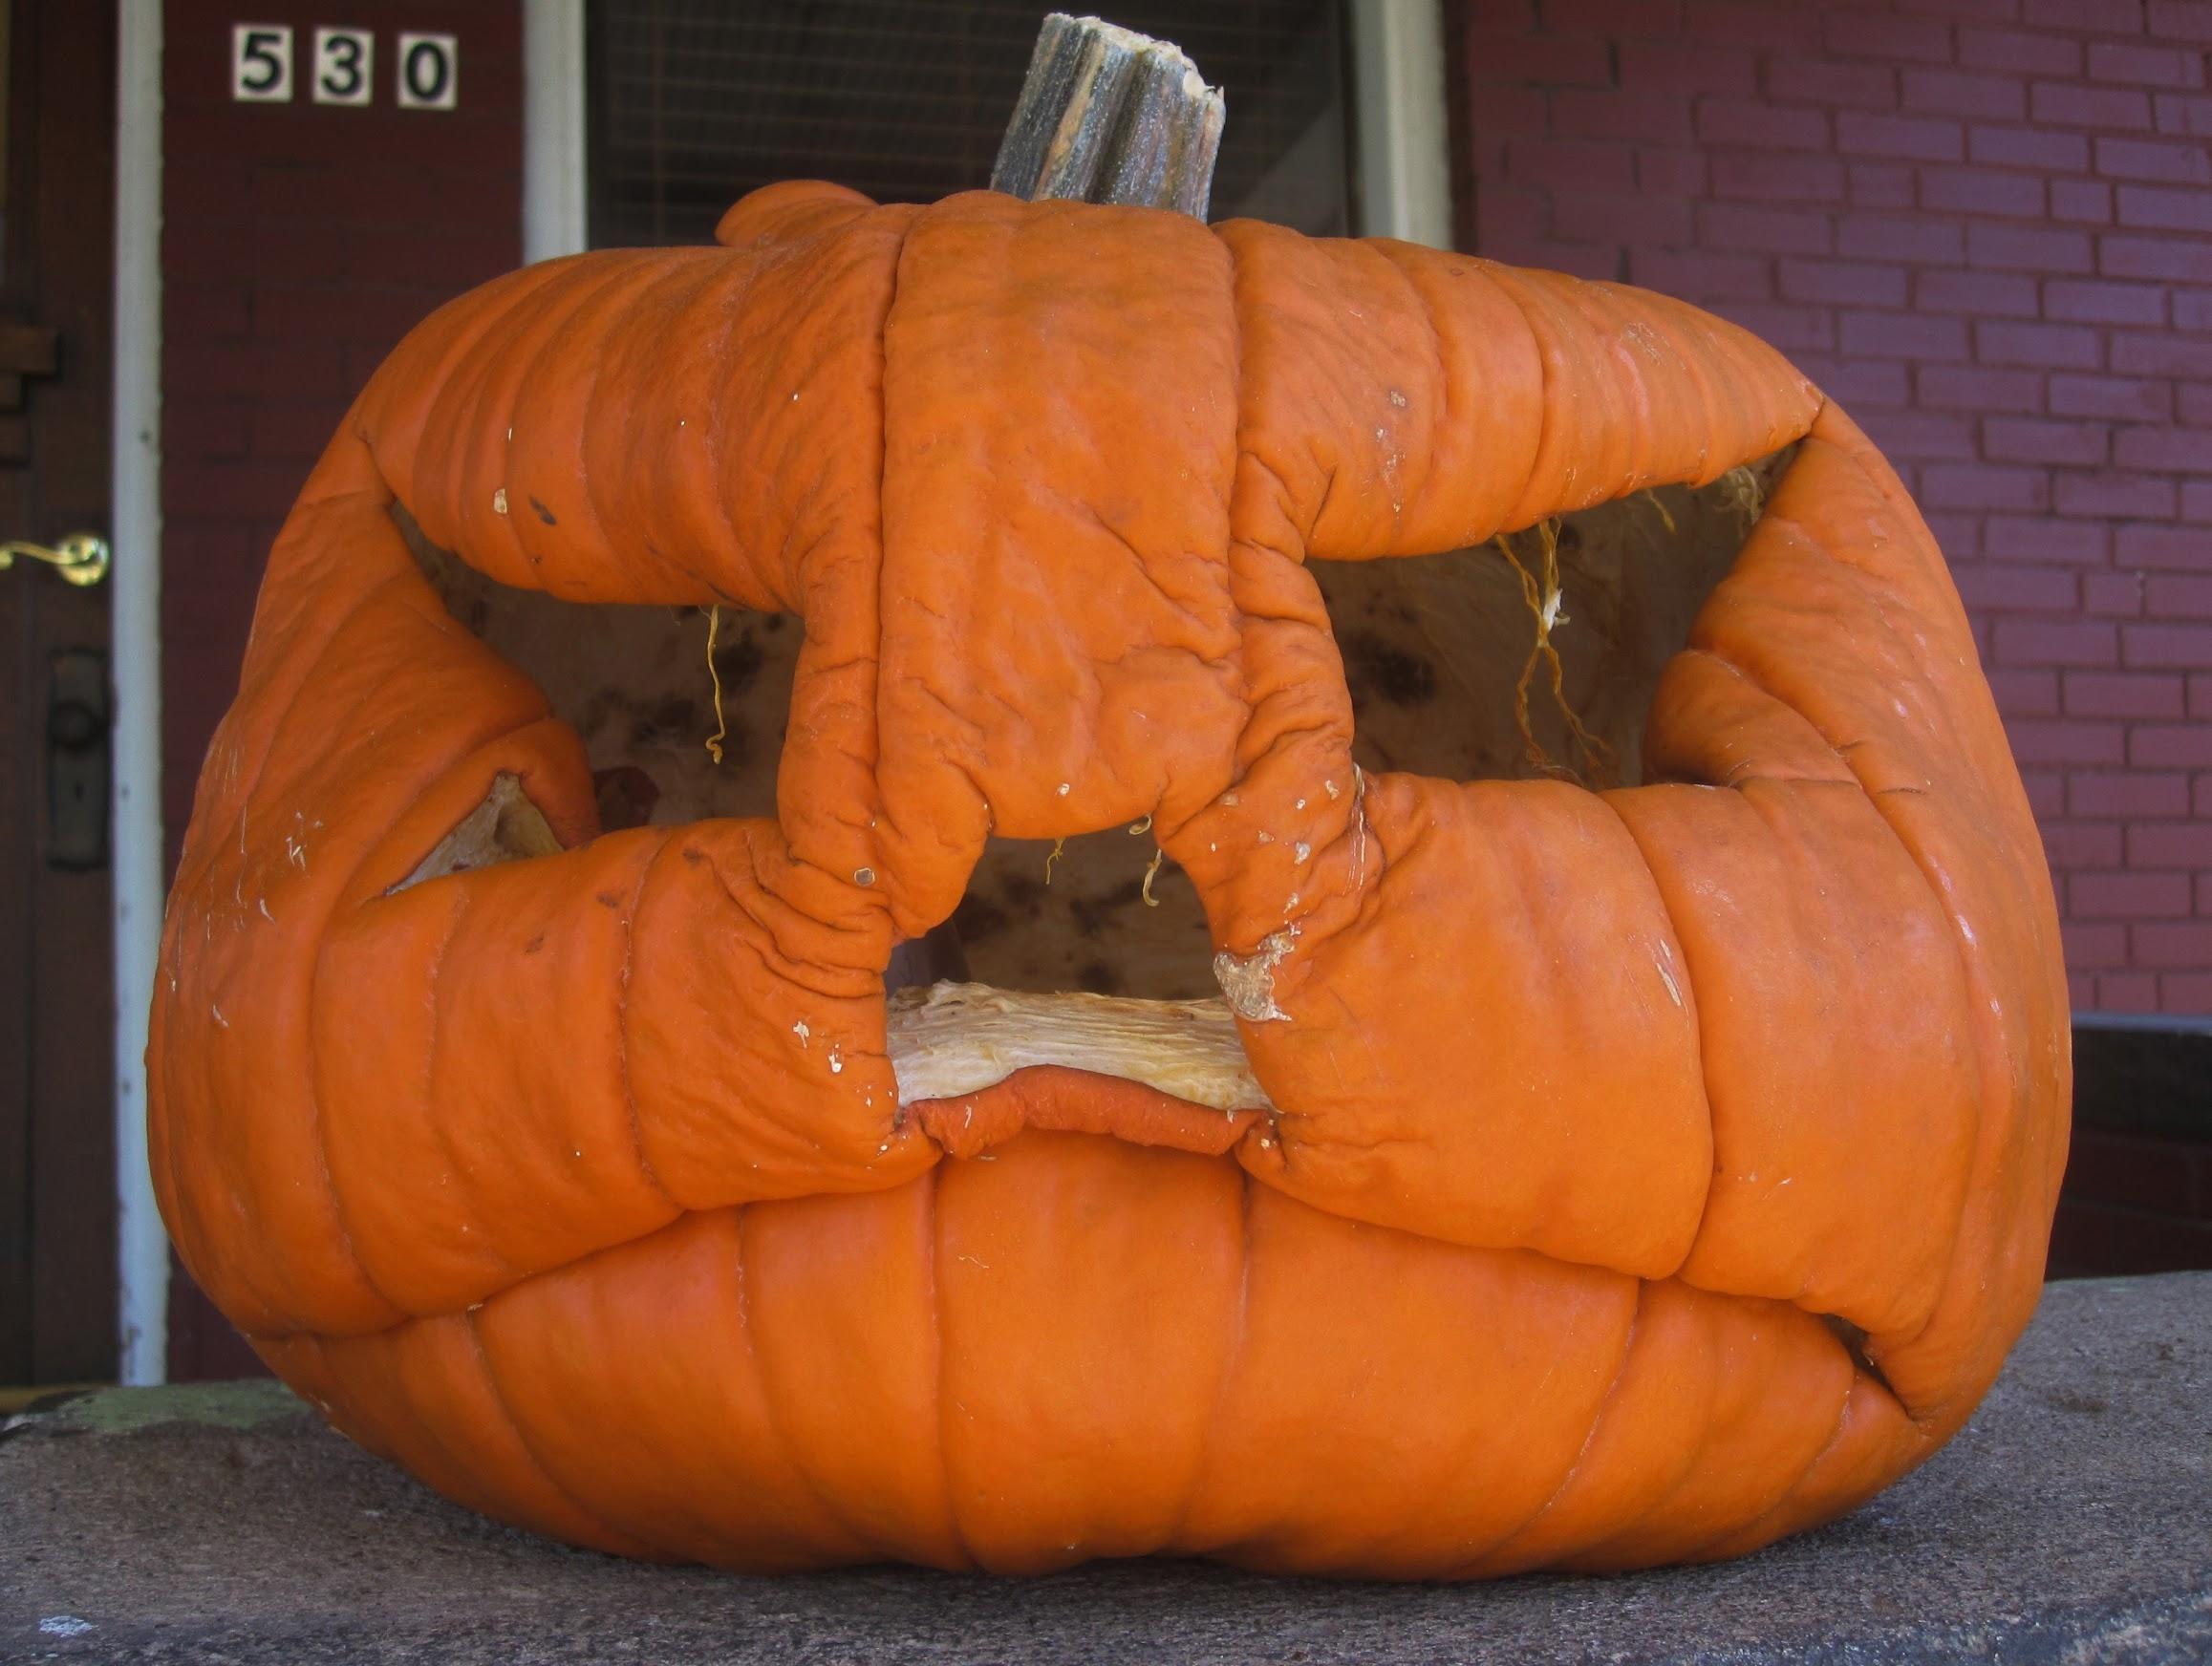 A grumpy pumpkin spotted in Denver